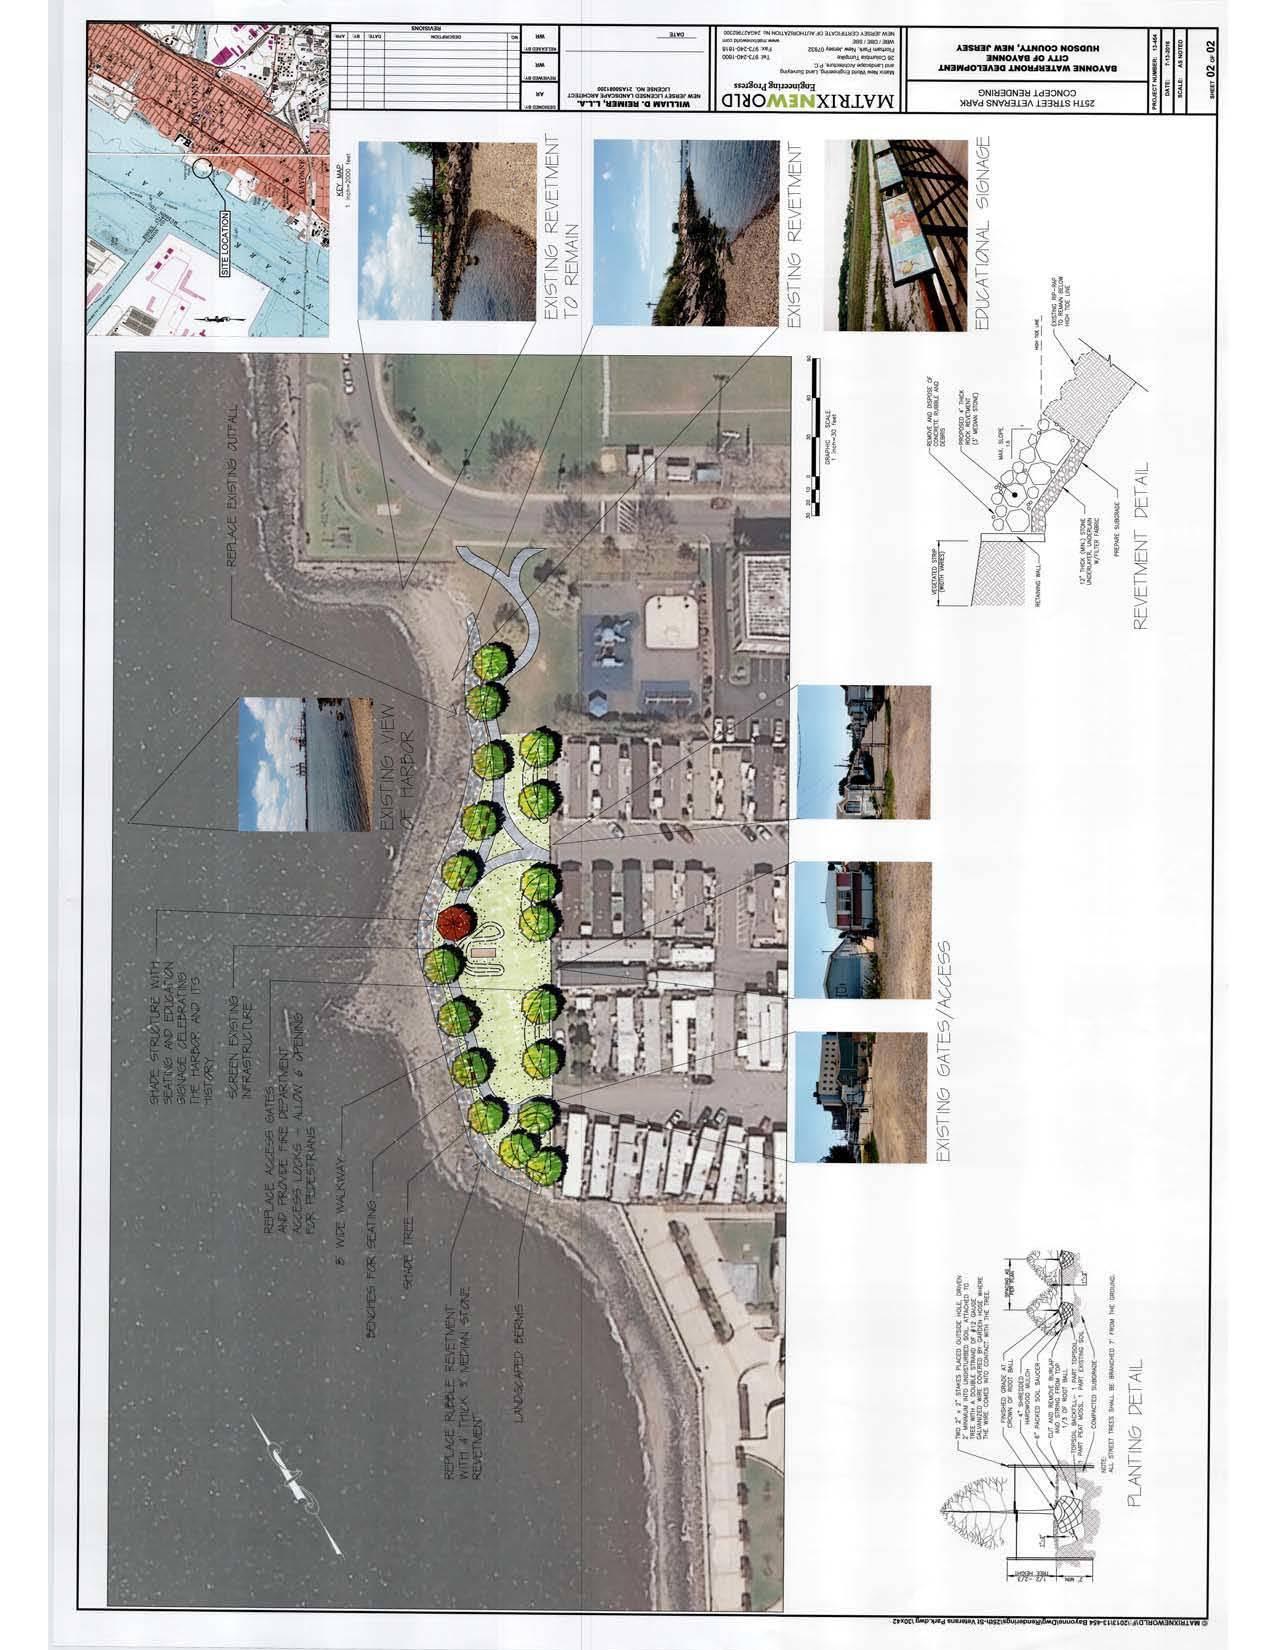 2c66d5fc588066145242_Conceptual_Site_Plan_1__Bayonne_.jpg